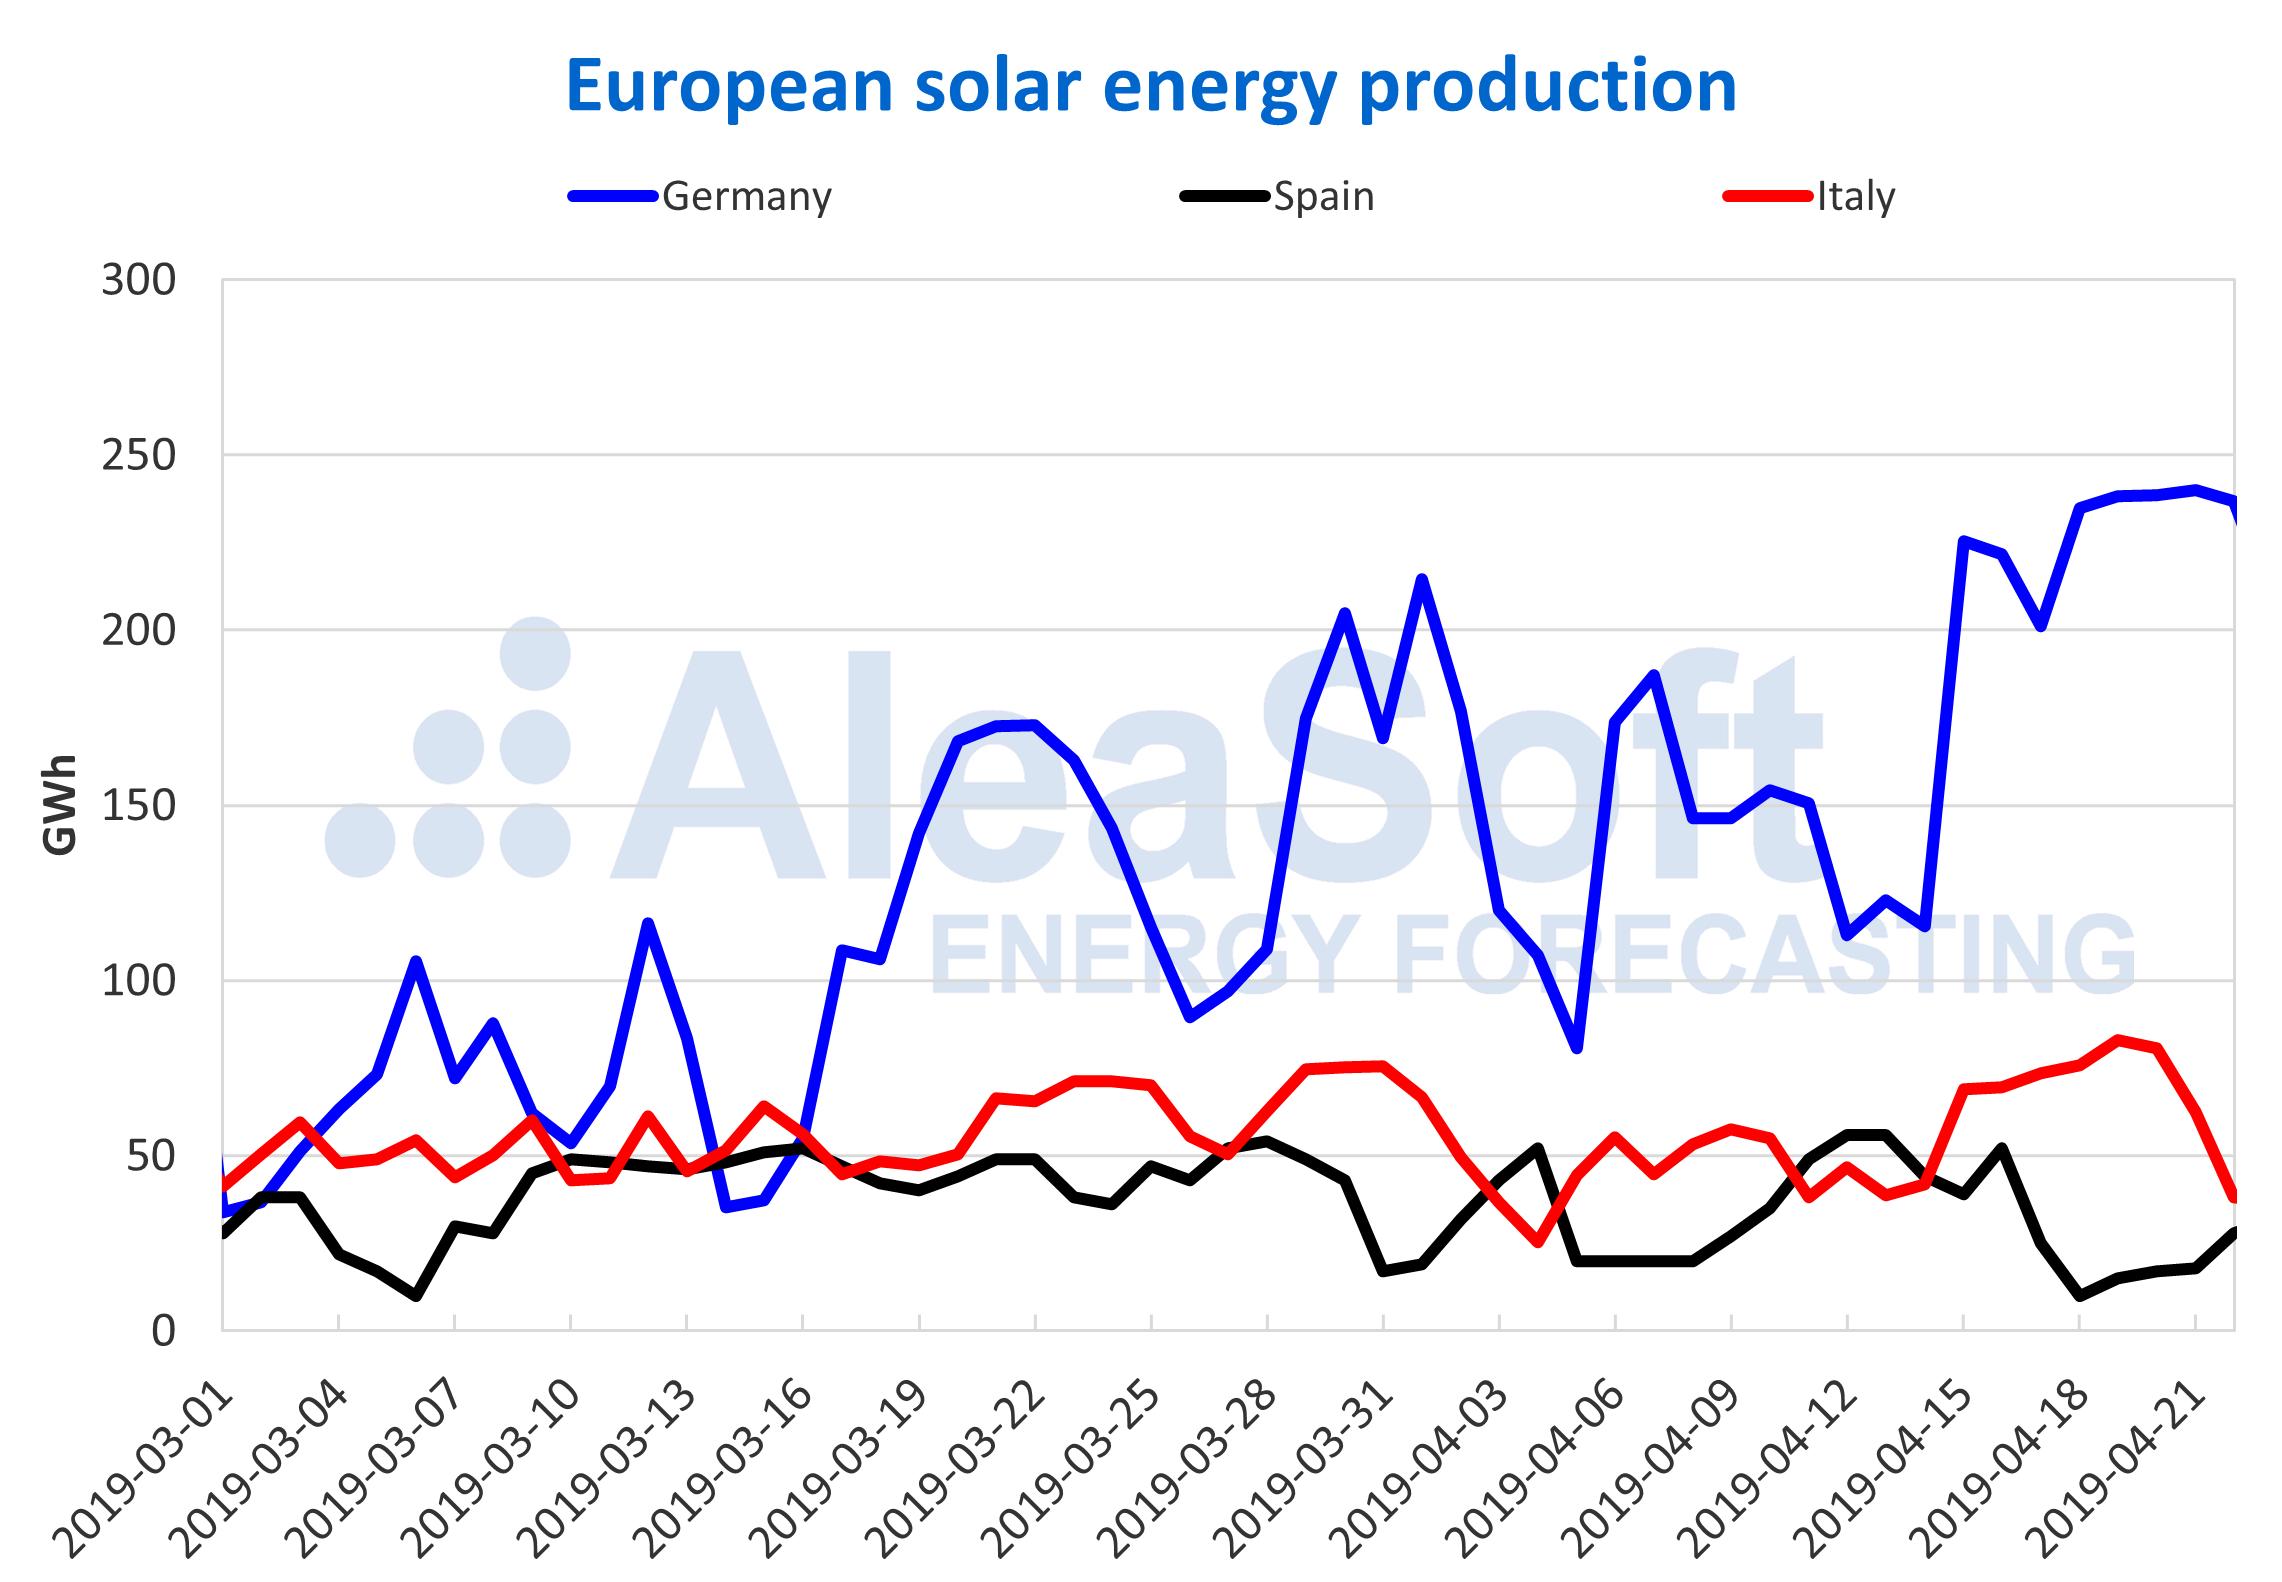 AleaSoft - Solar photovoltaic thermosolar energy production electricity Europe